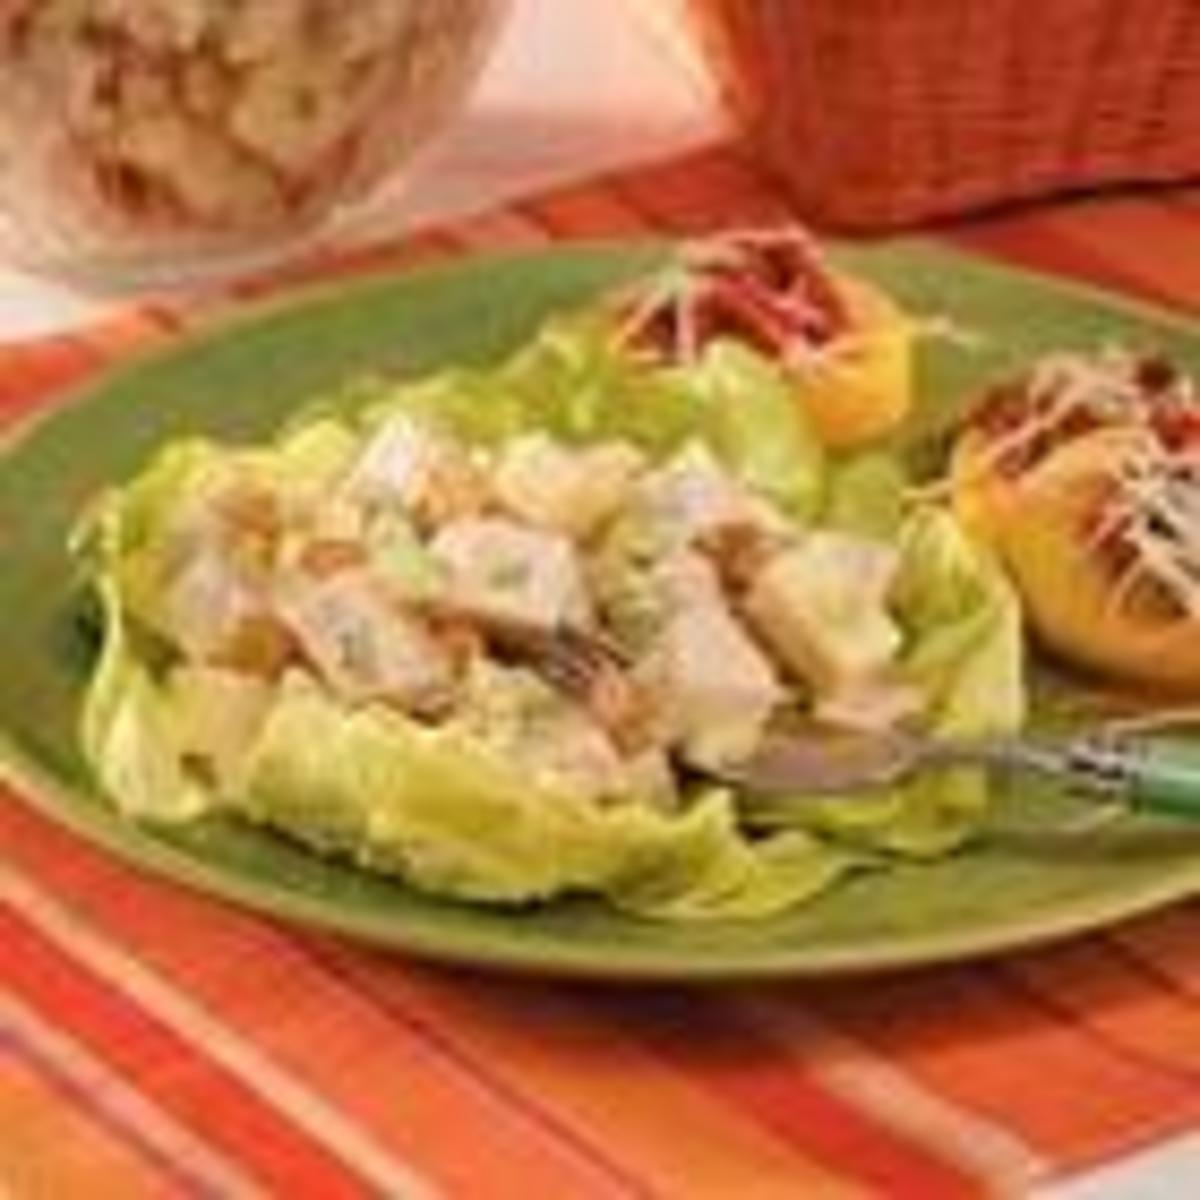 Chutney Turkey Salad (from Allrecipes)